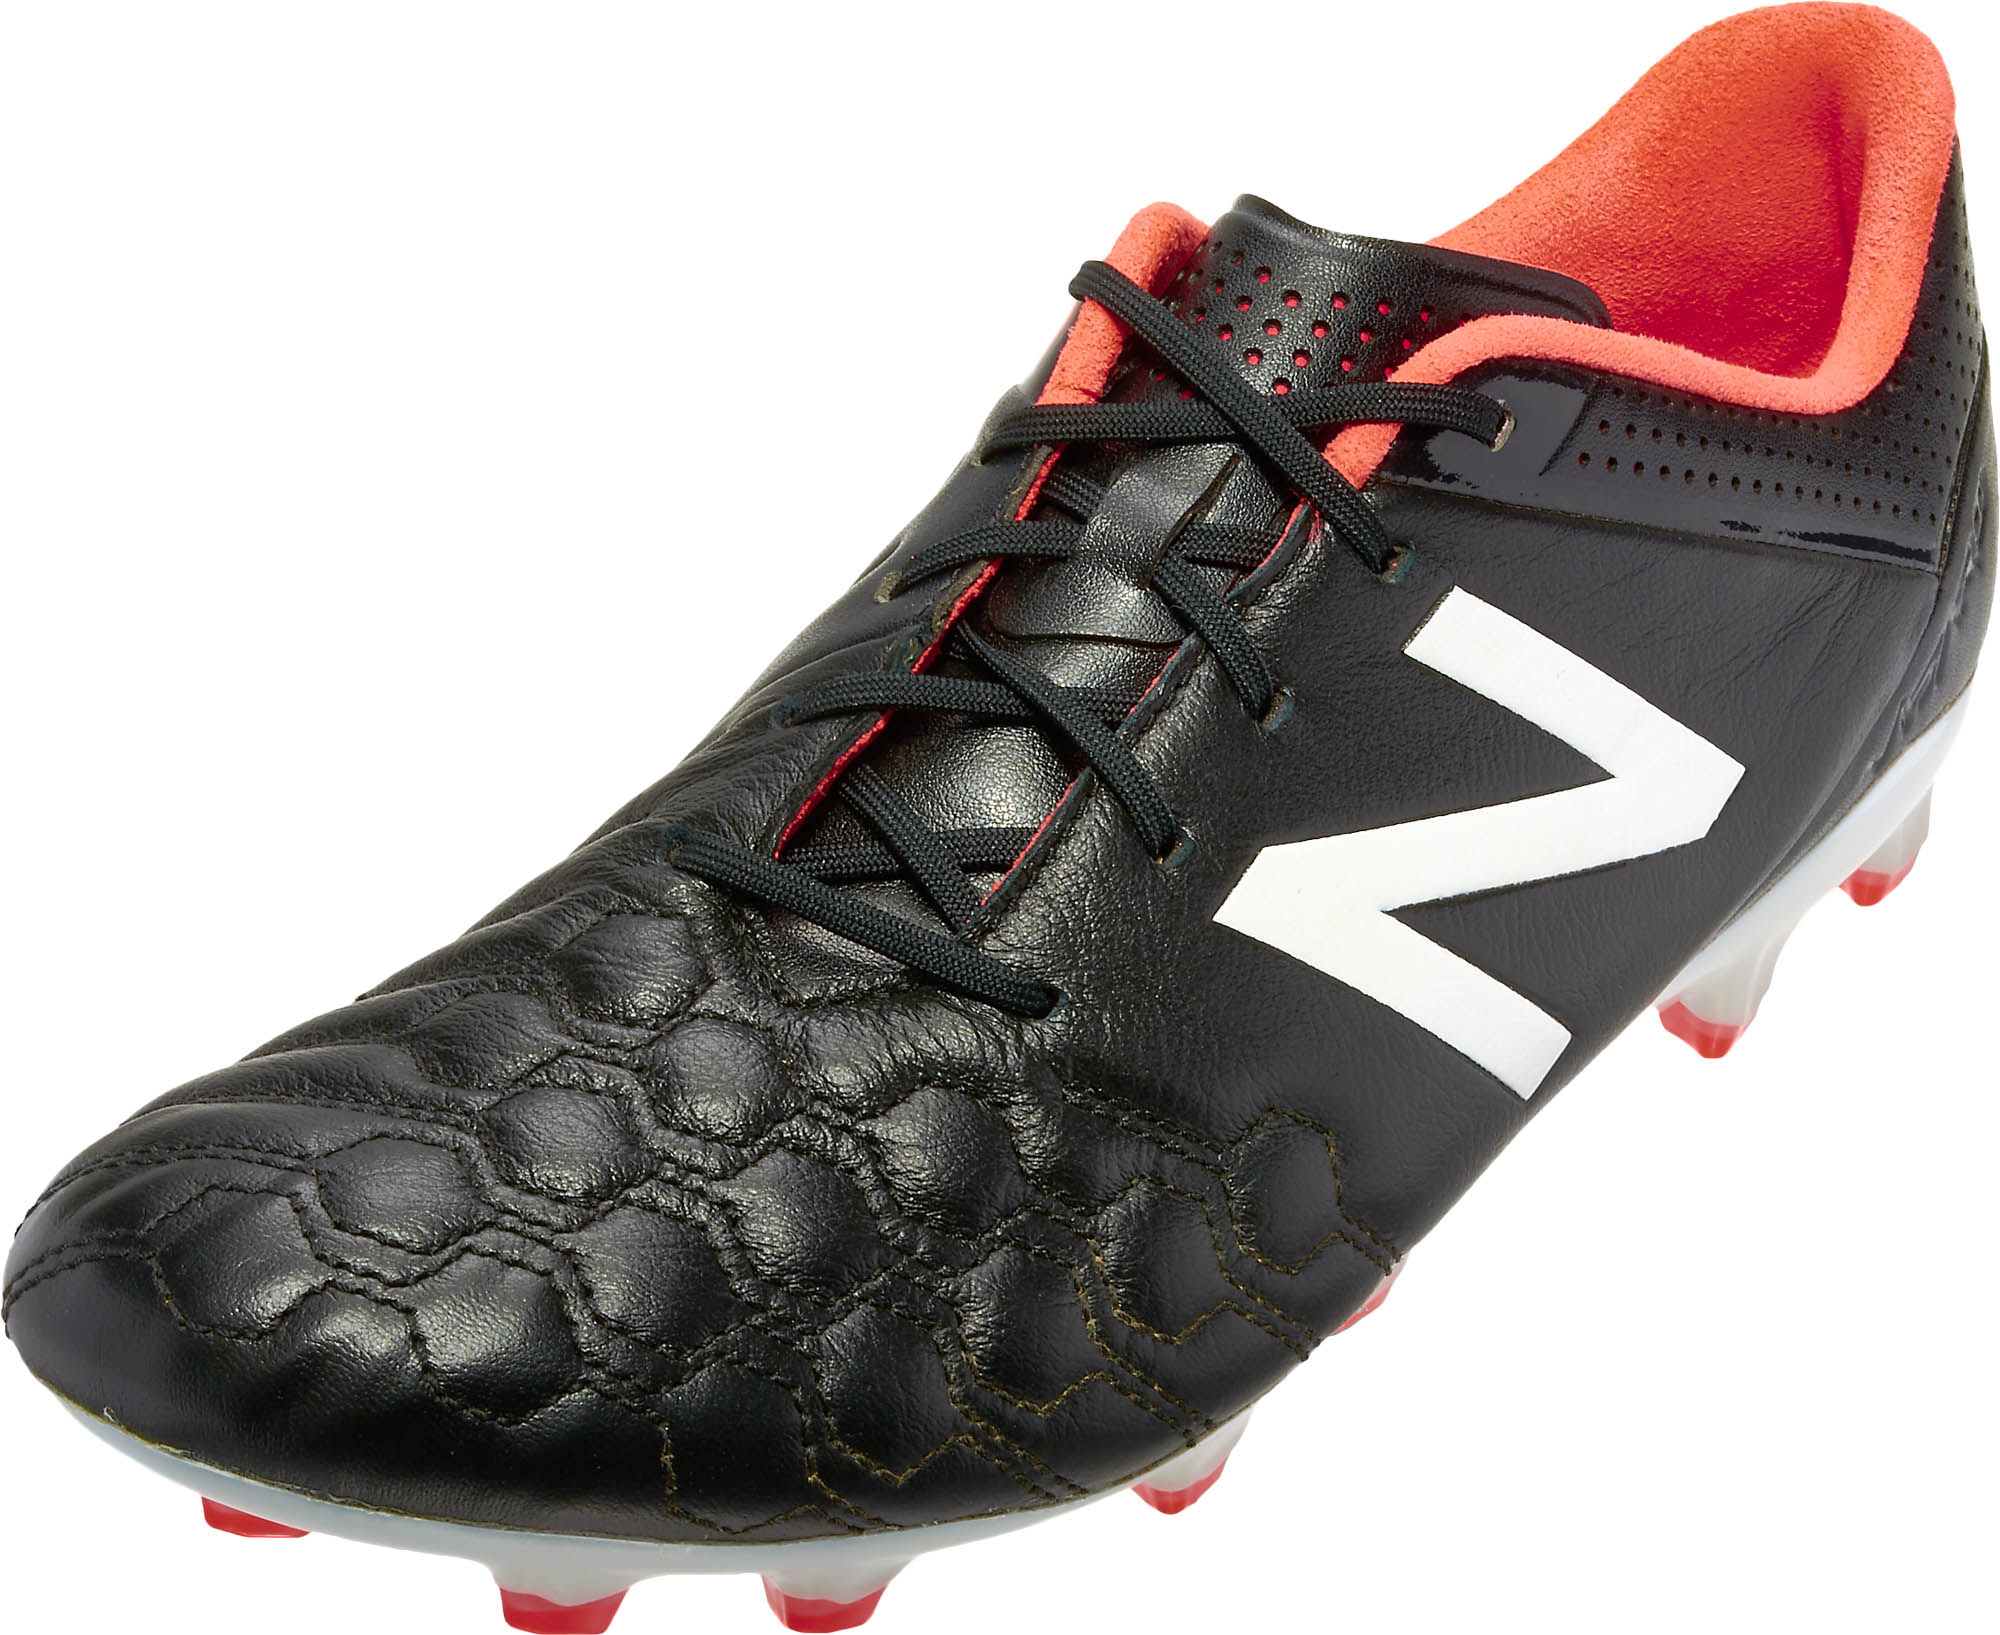 5319dc7bbee6a New Balance K-Lite Visaro Cleats - Black New Balance Soccer Shoes